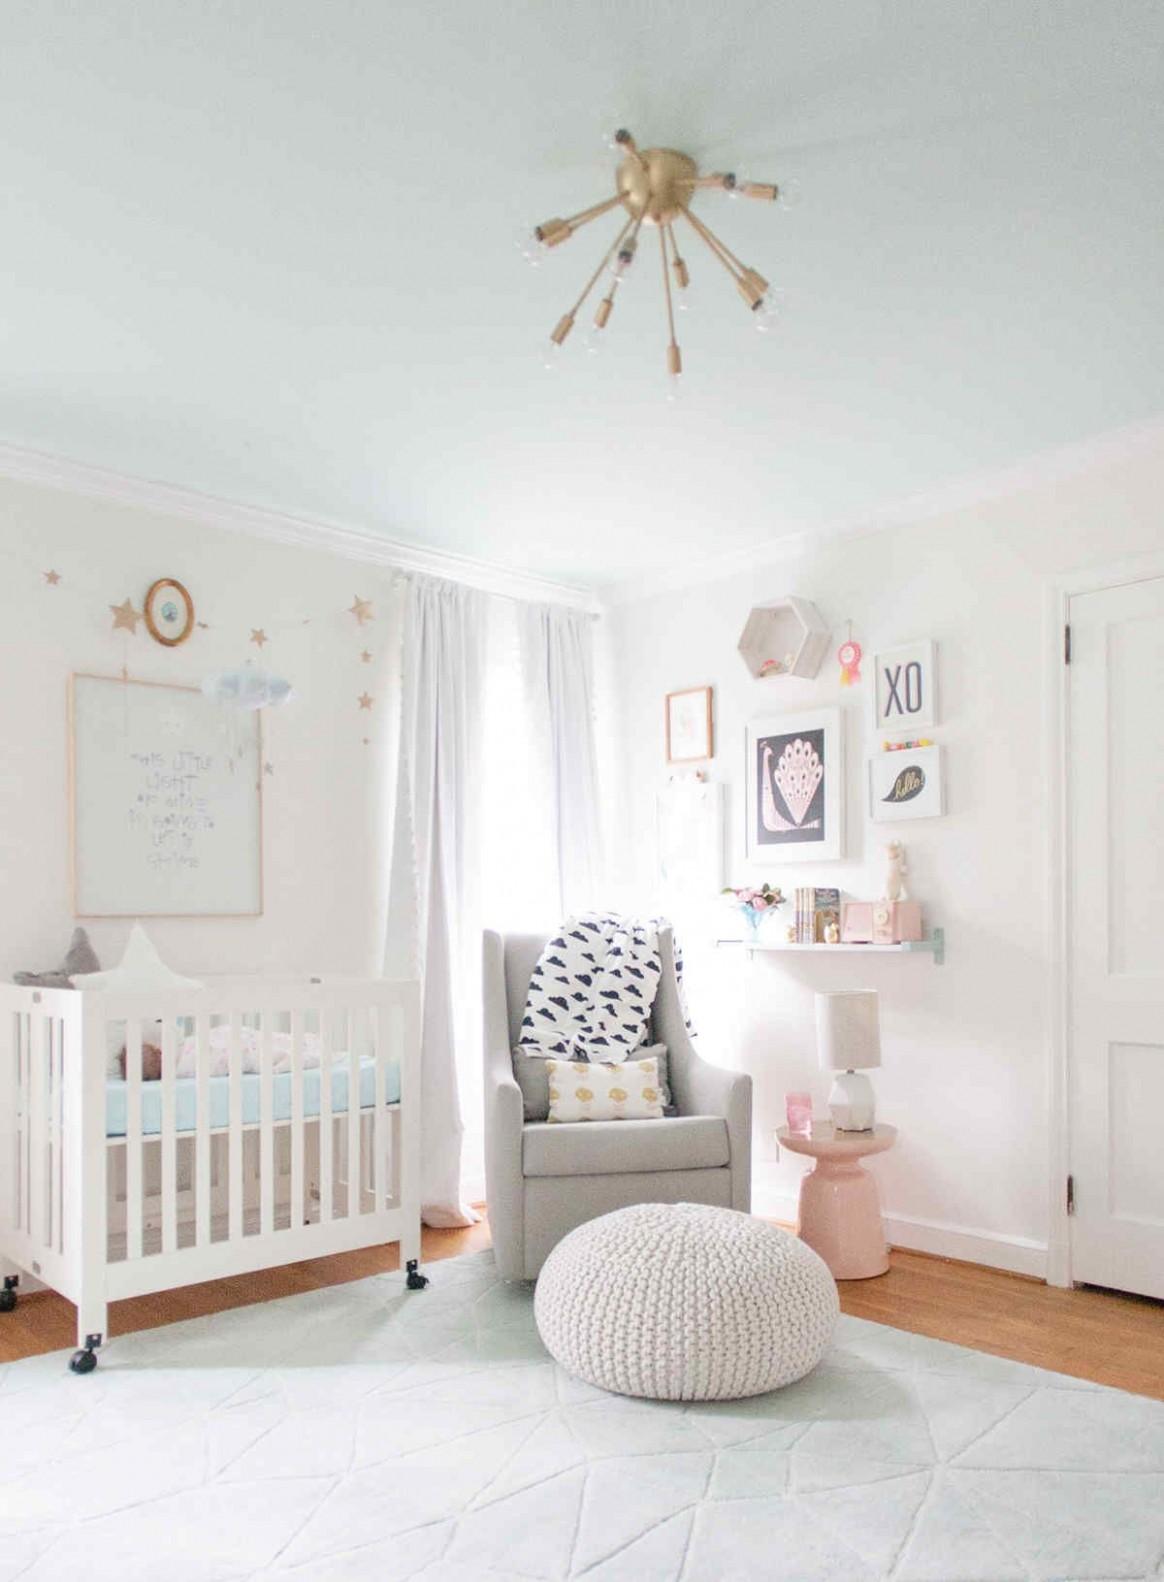 Ellie James Nursery - Lay Baby Lay  Baby girl room, Girl room  - Wall Decor Ideas Baby Room